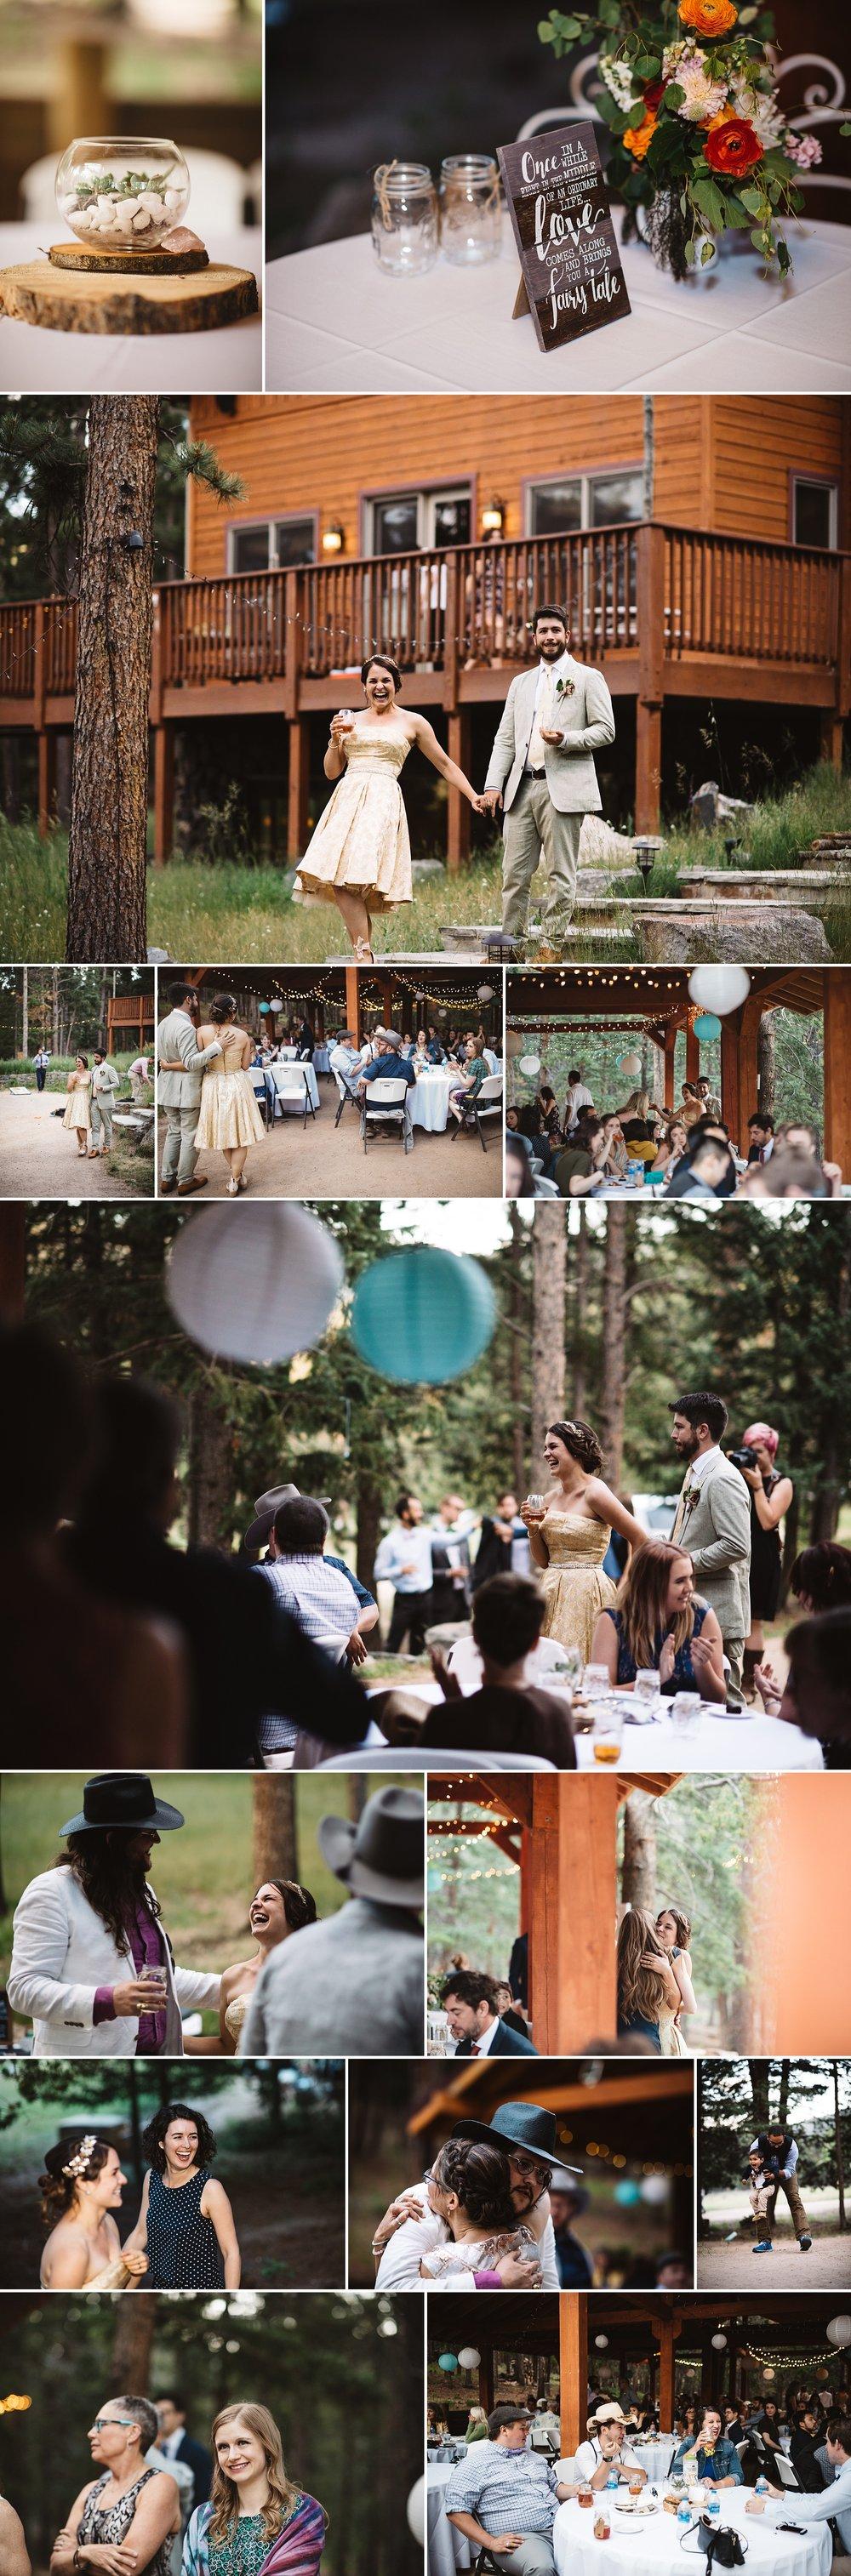 Ansley+Julian-Willow-Creek-Ranch-Evergreen-Wedding-015_WEB.jpg